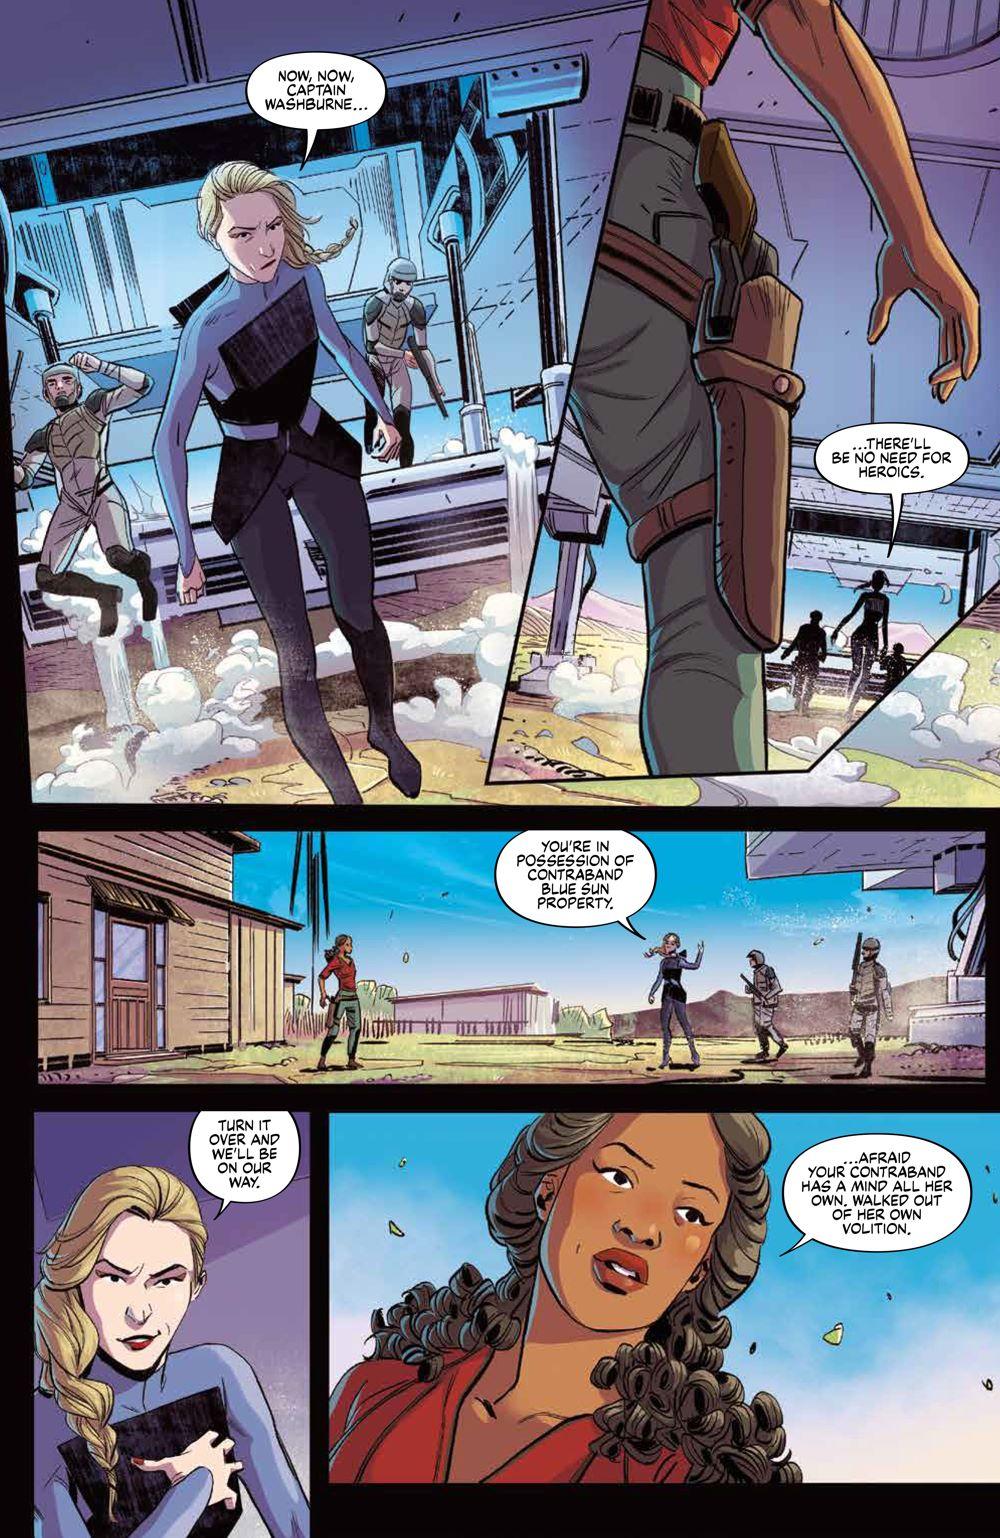 Firefly_BrandNewVerse_004_PRESS_4 ComicList Previews: FIREFLY A BRAND NEW 'VERSE #4 (OF 6)